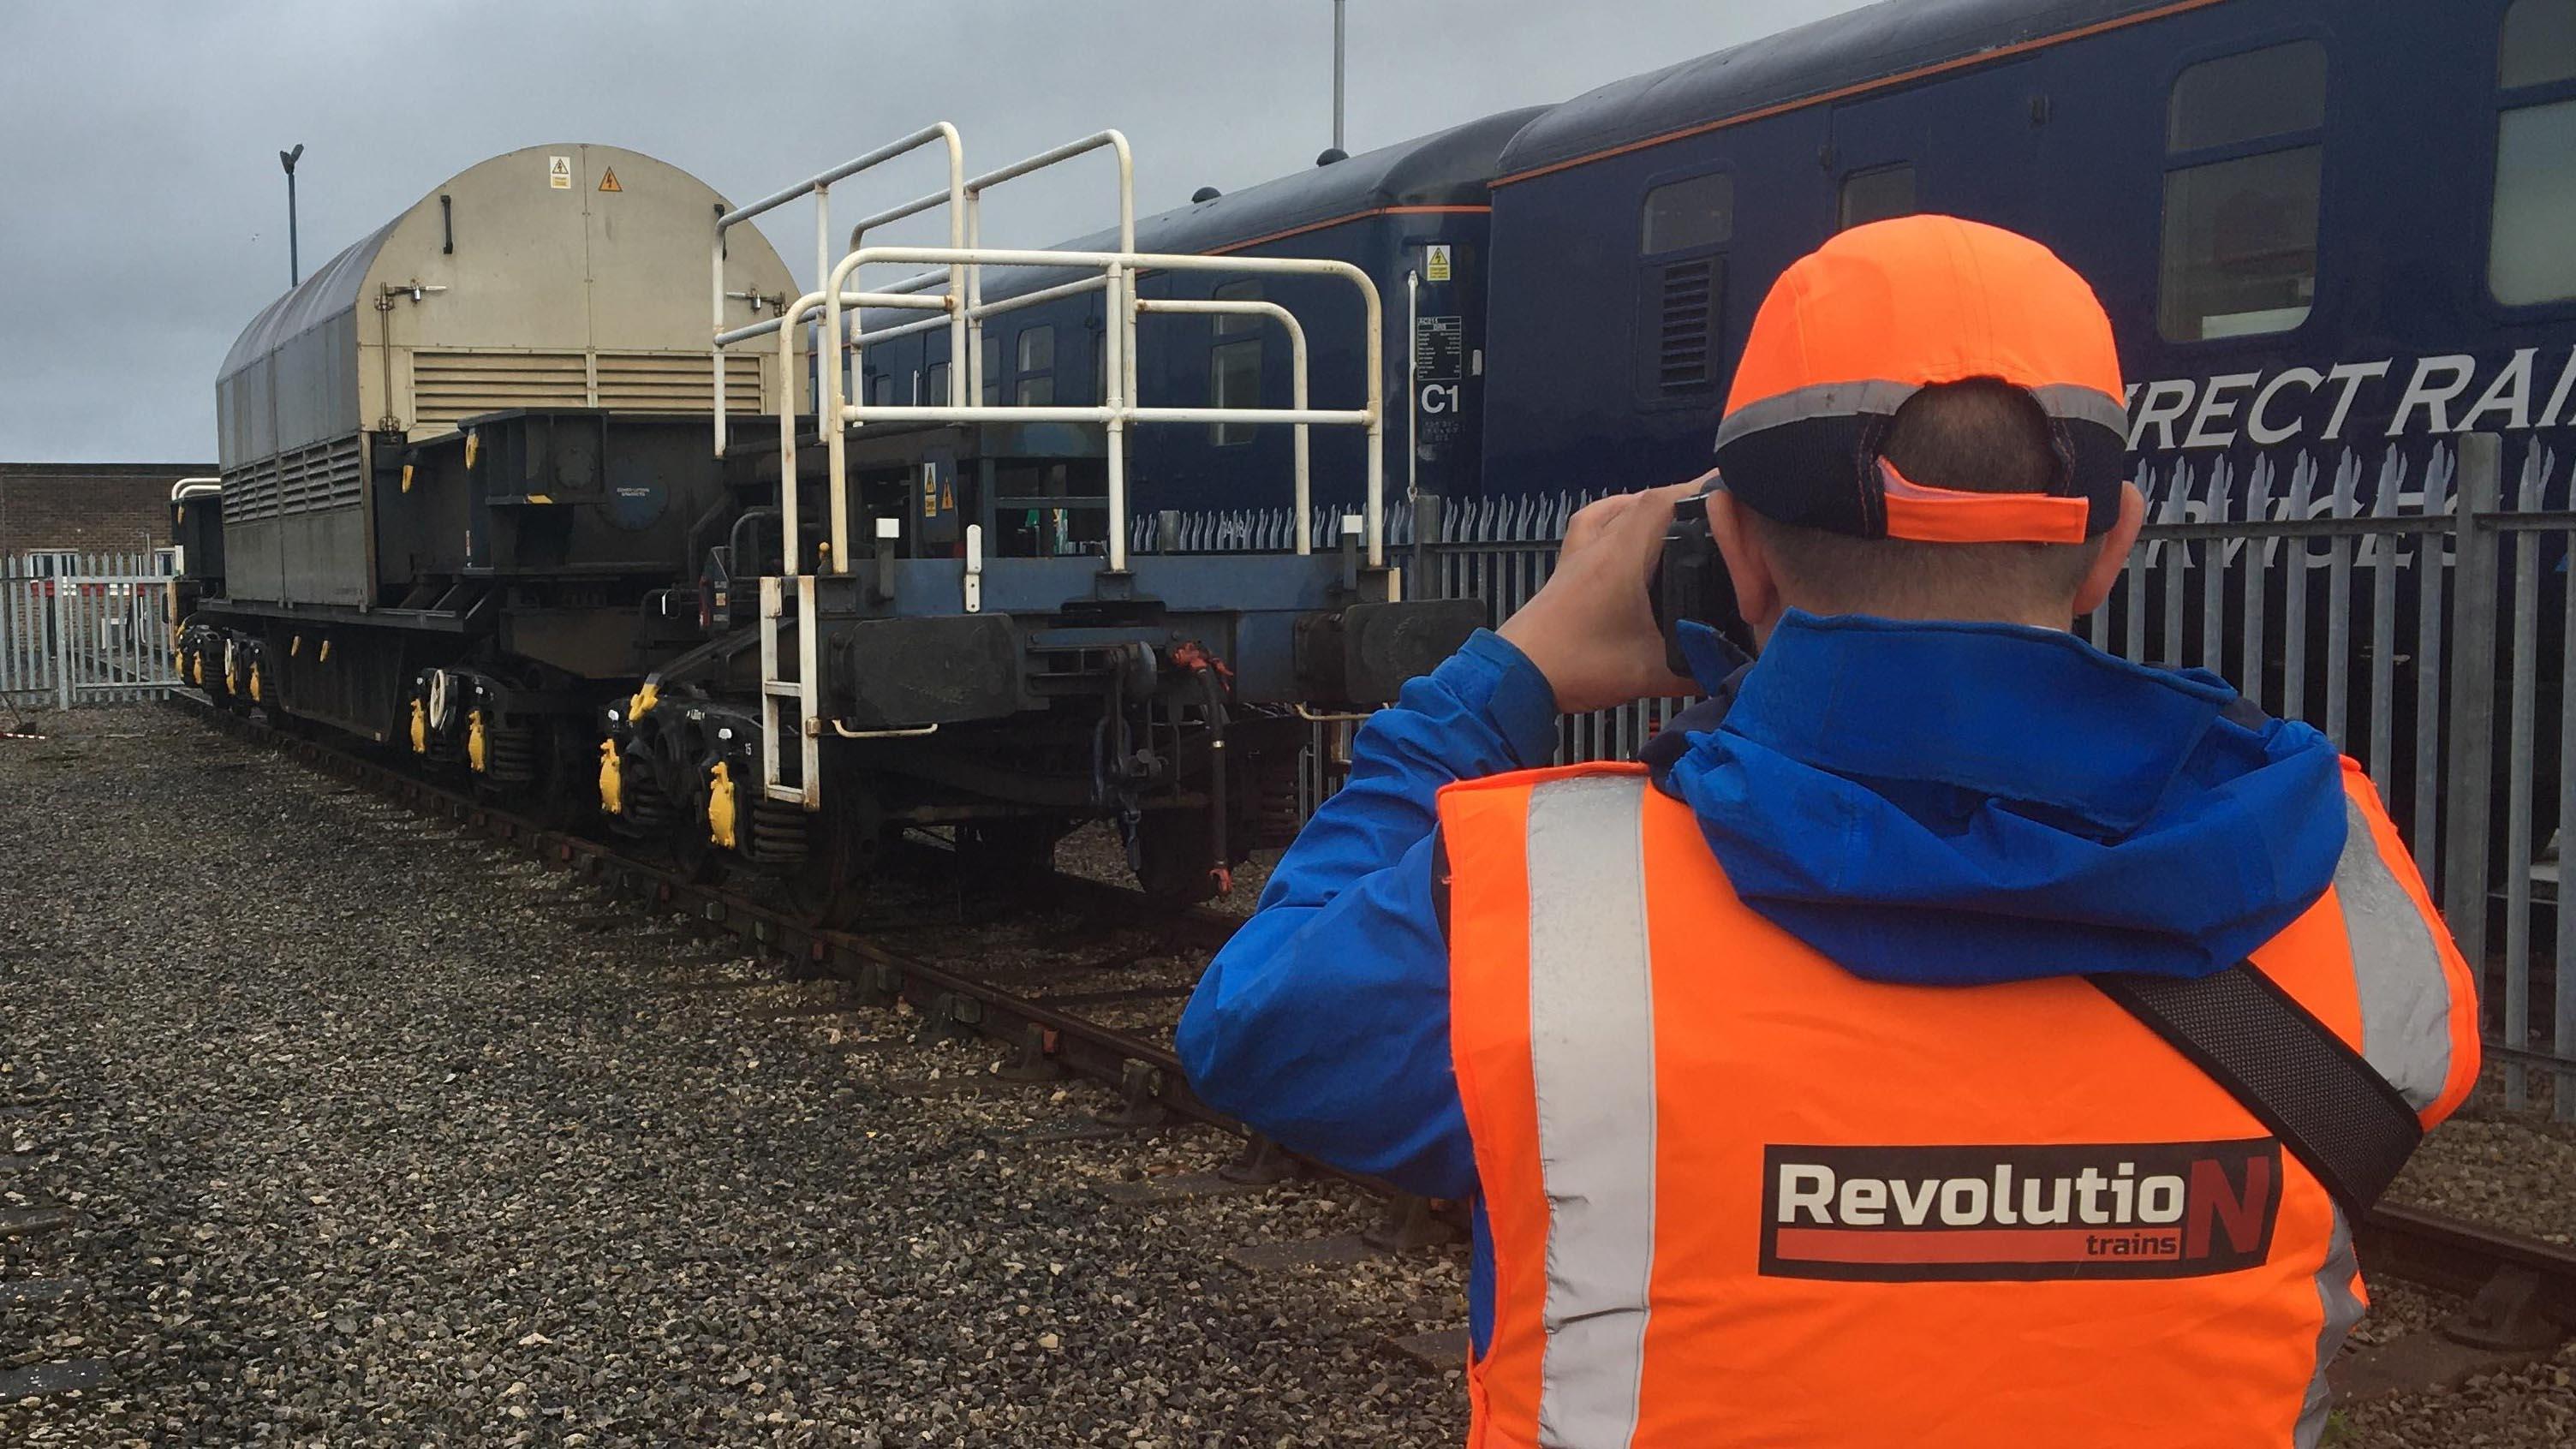 We-Are-Railfans-Revolution-Trains